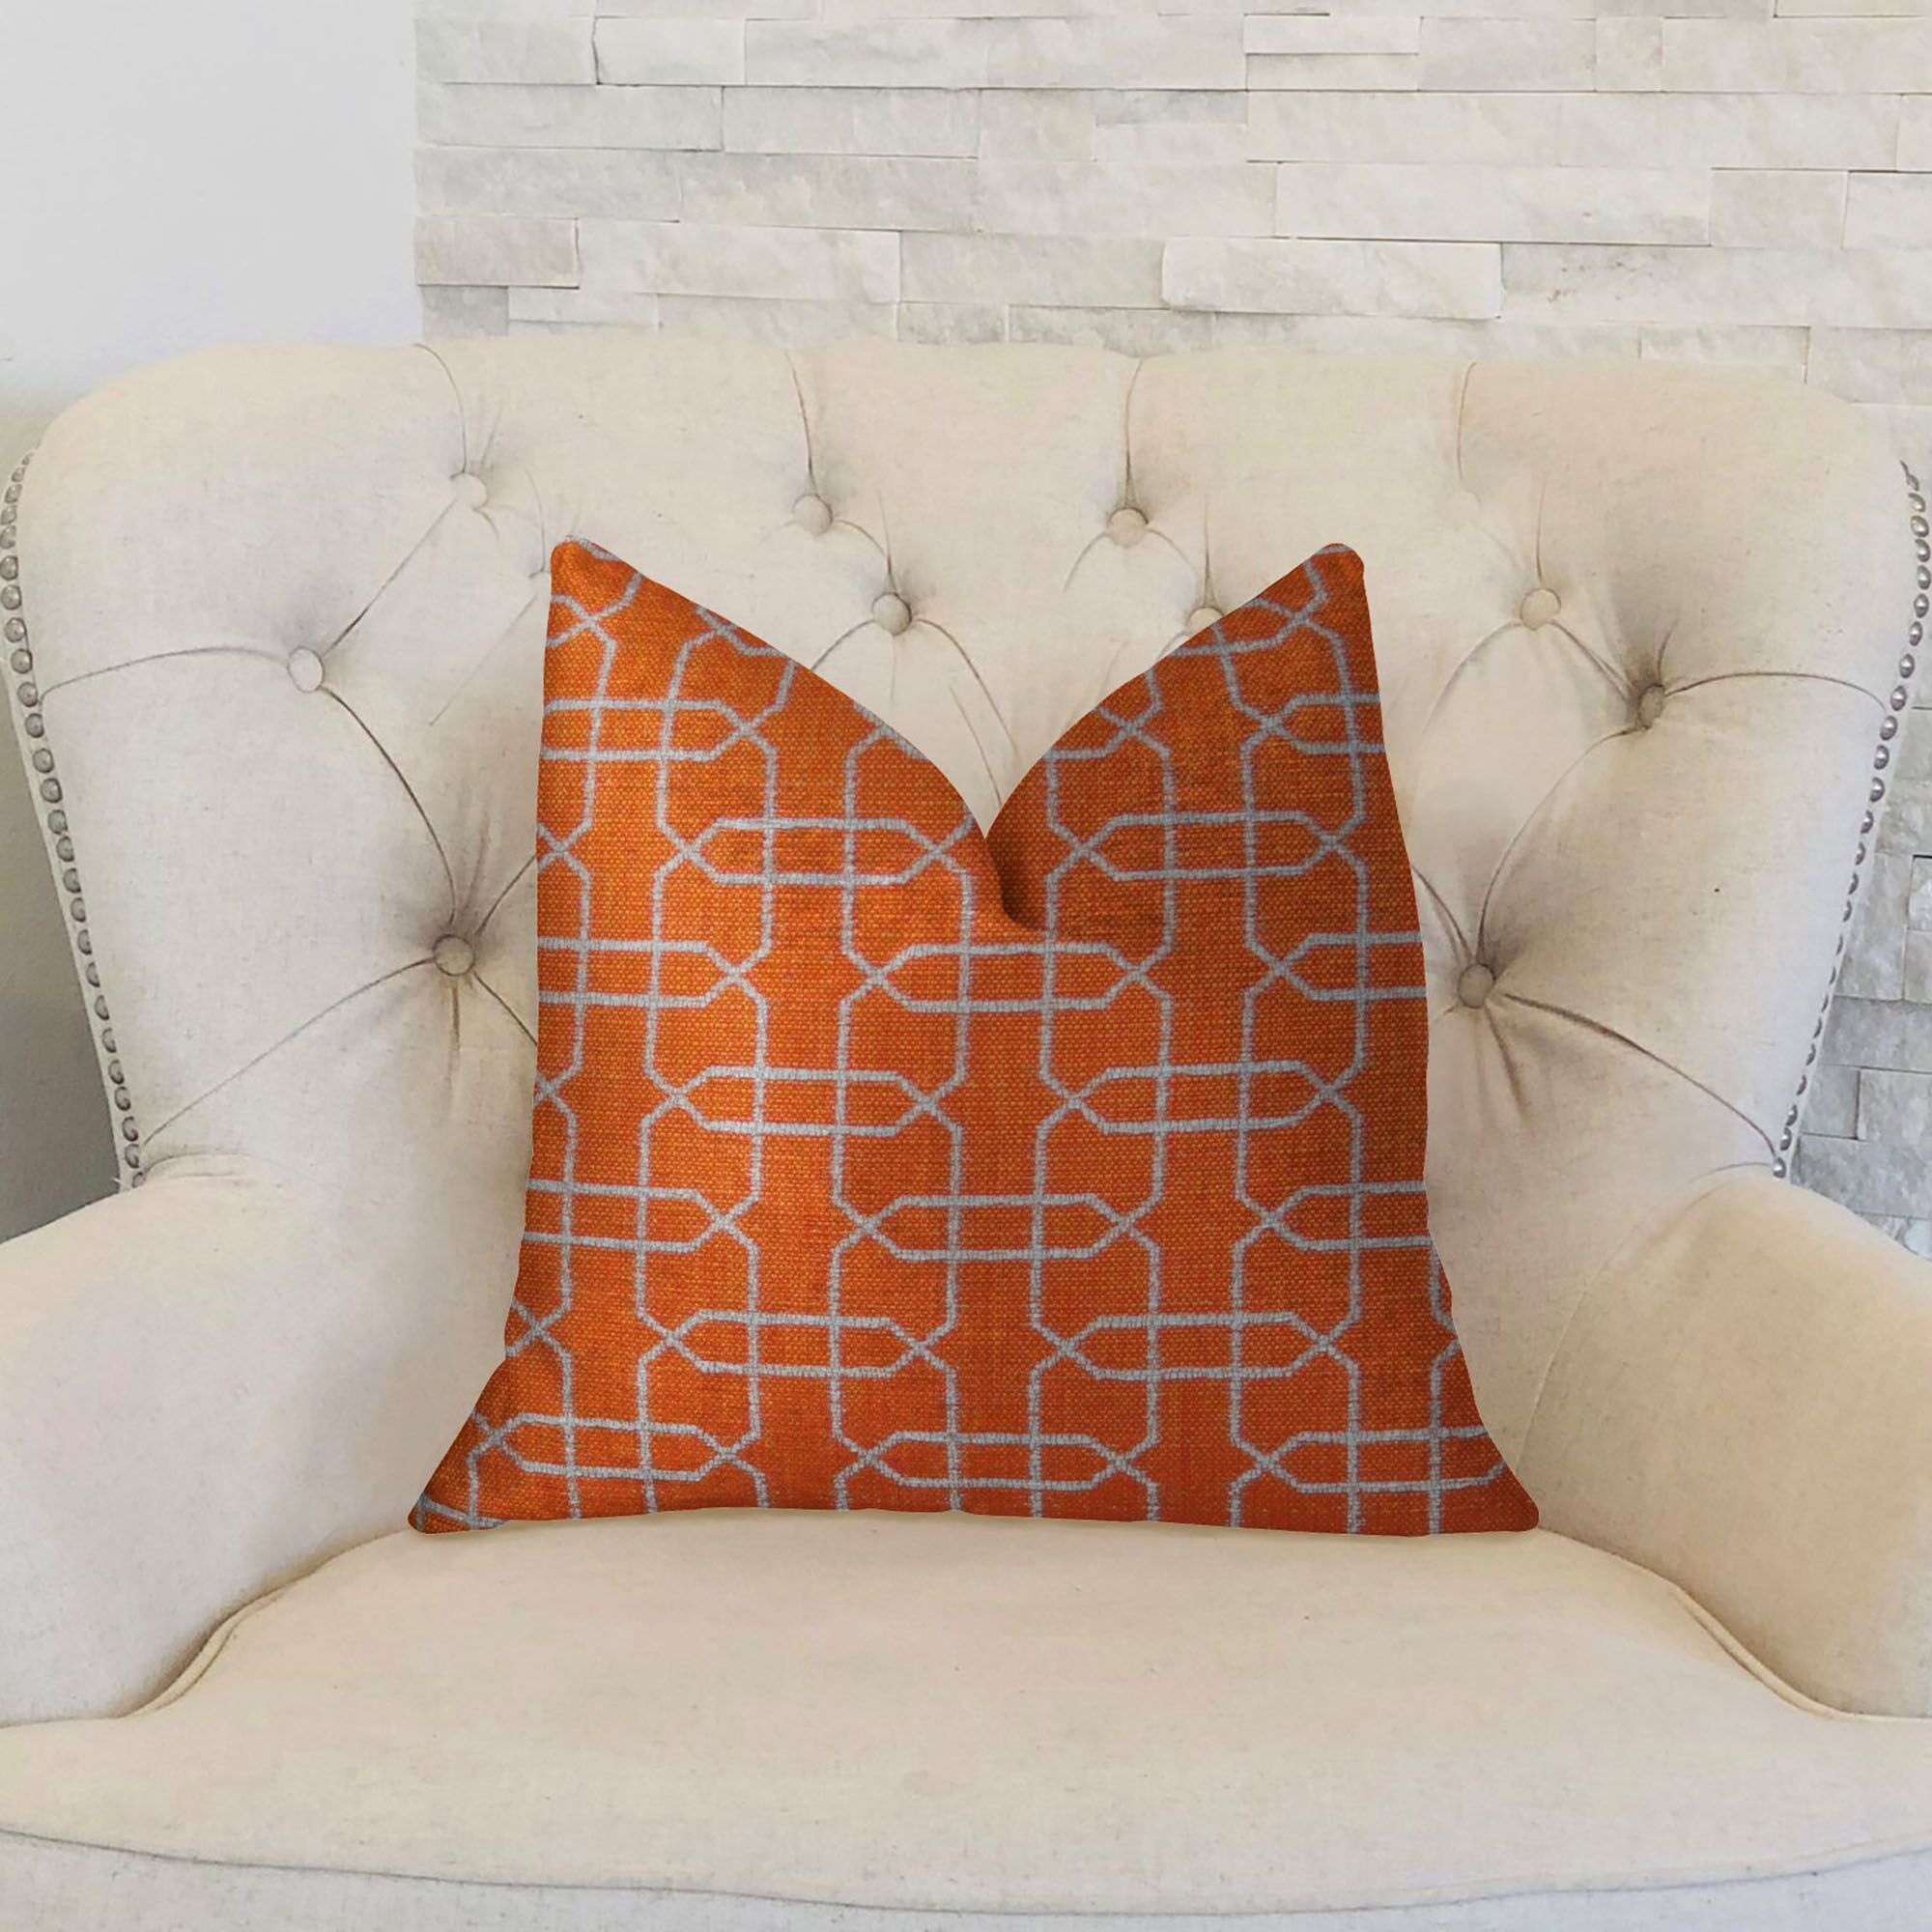 Ardmore Persimmon Handmade Throw Pillow Size: 20